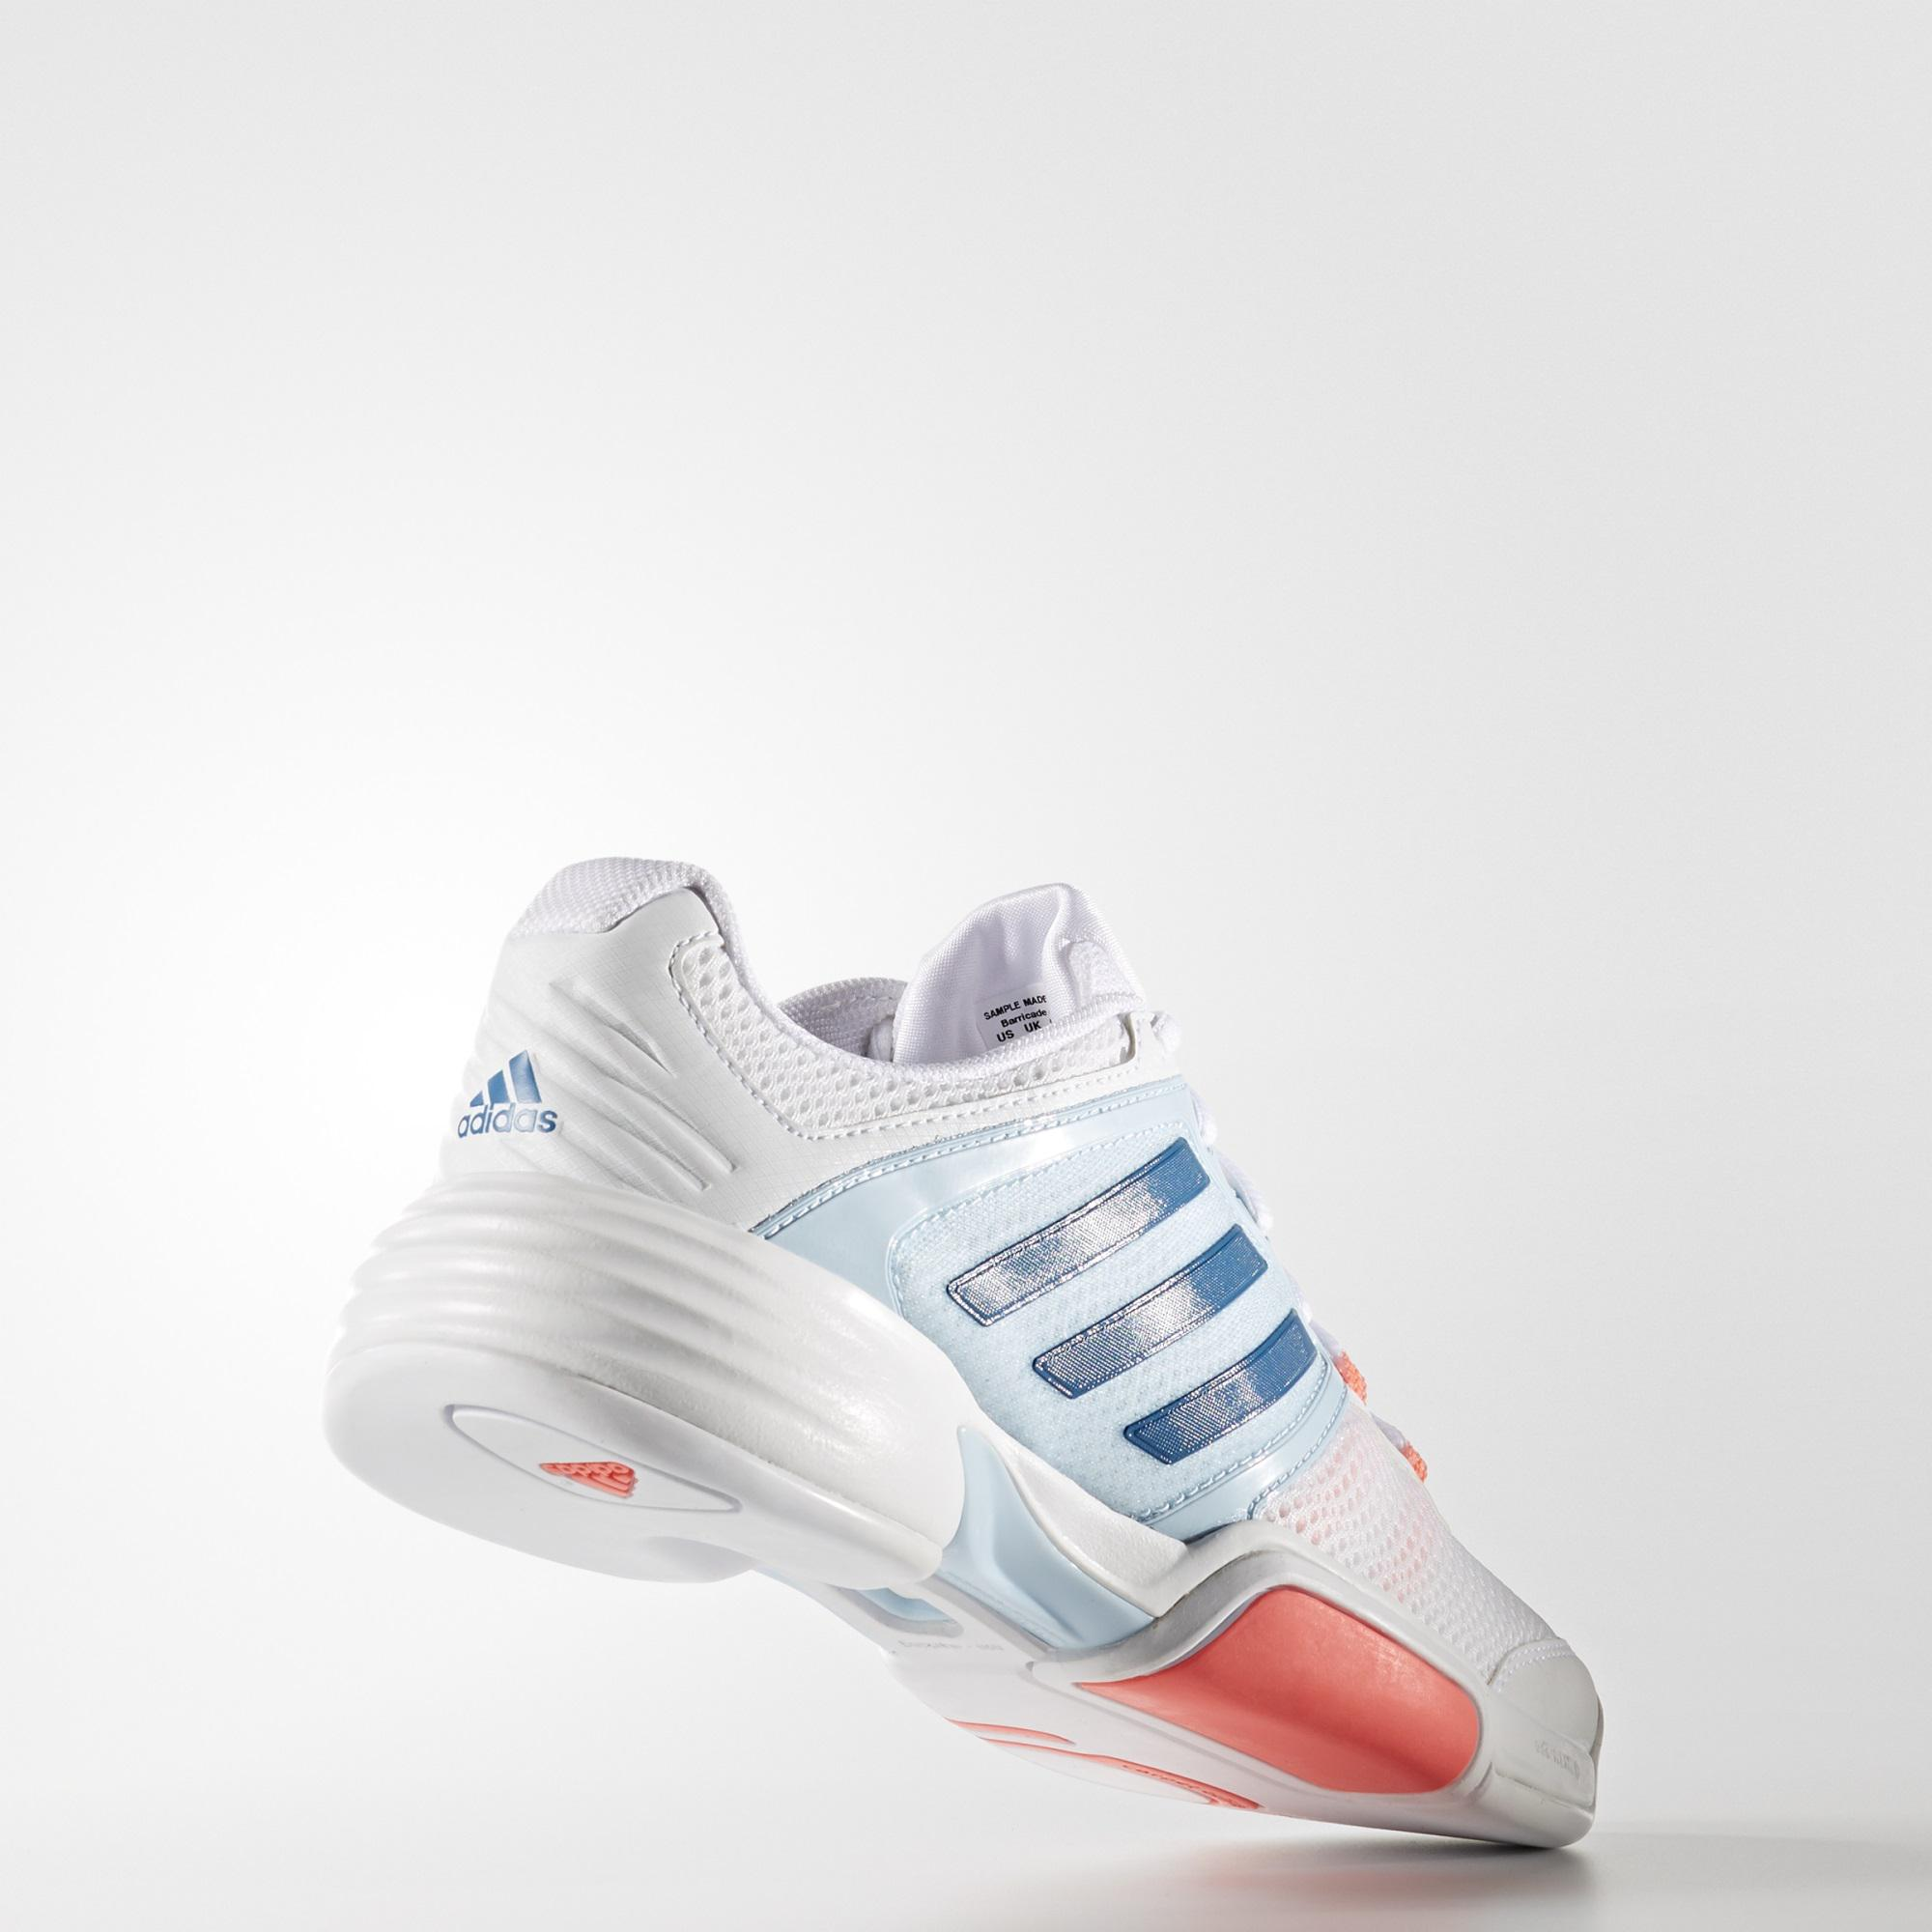 Adidas Womens Barricade Club Carpet Tennis Shoes - White Blue ... cd940b02e